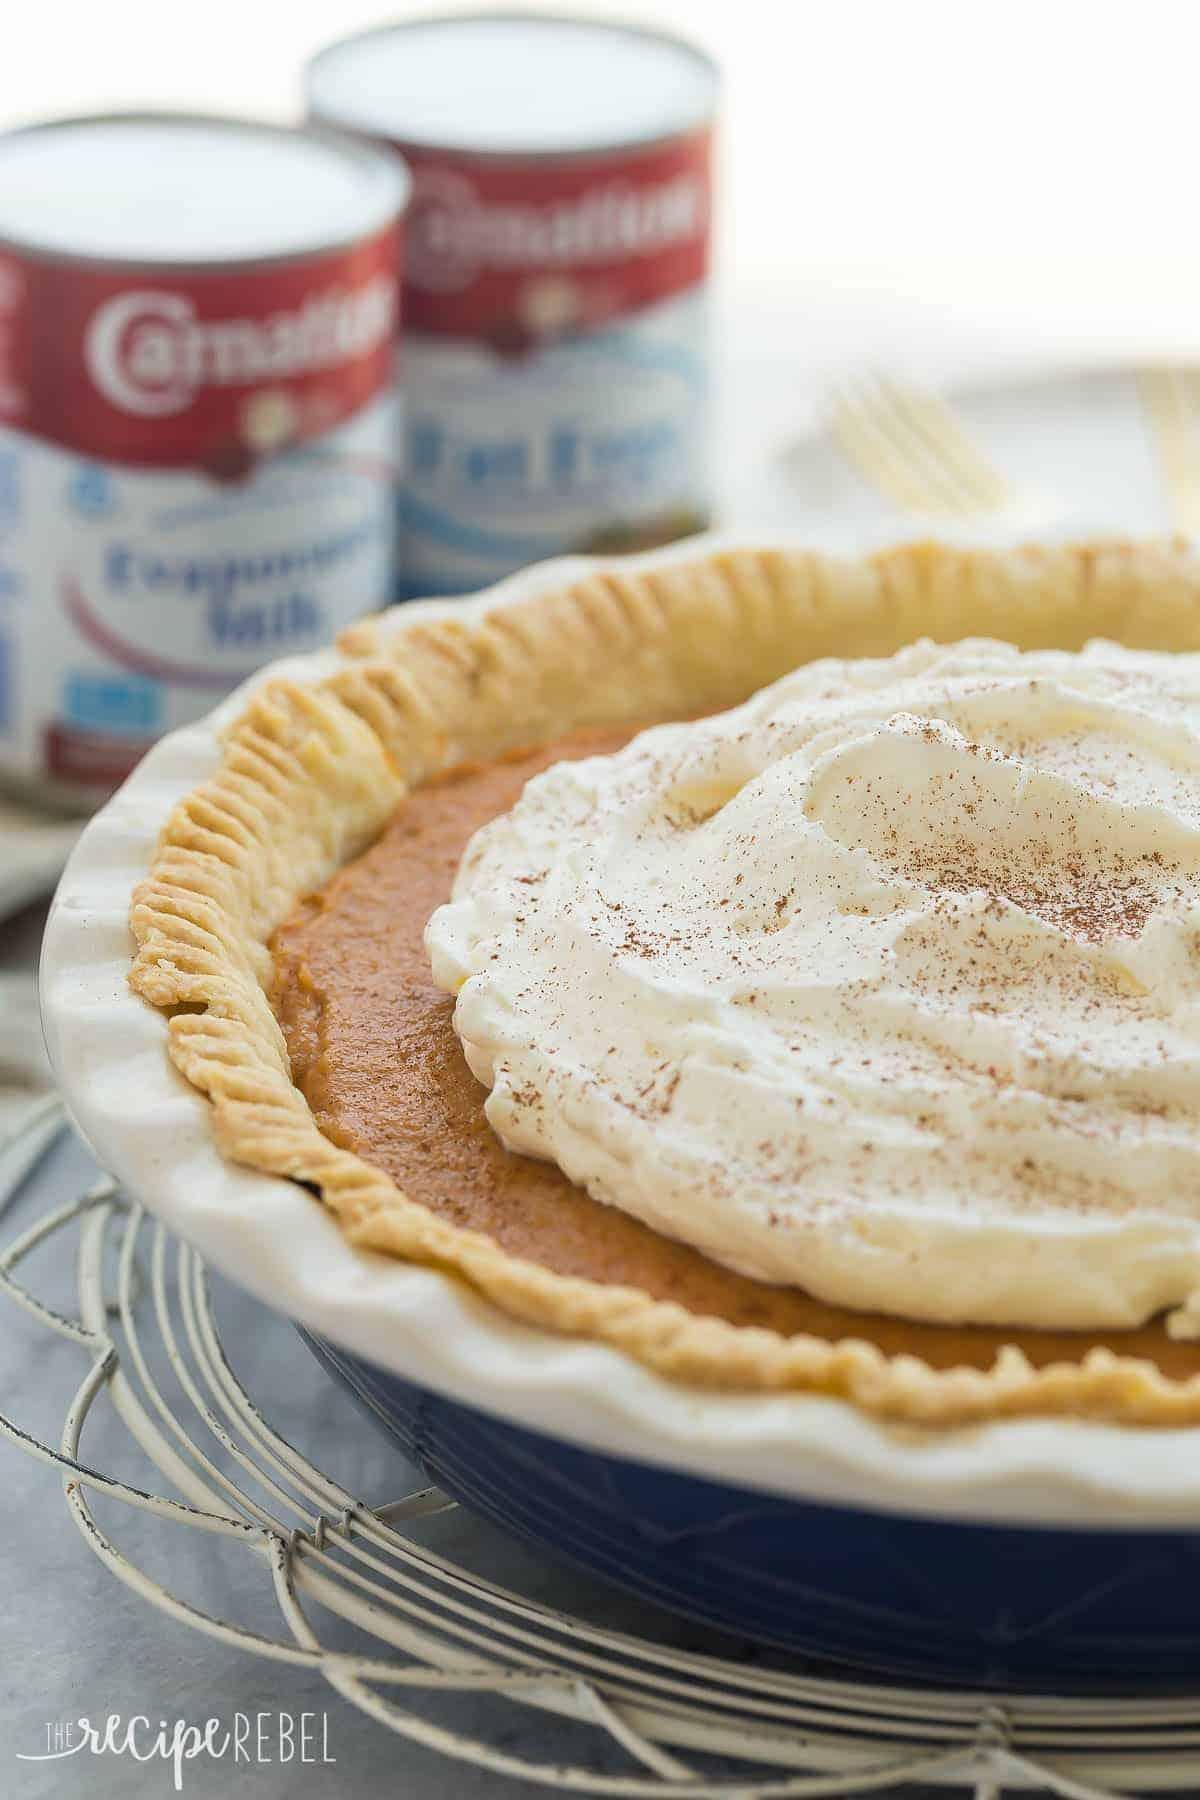 Cream eating her husband pie